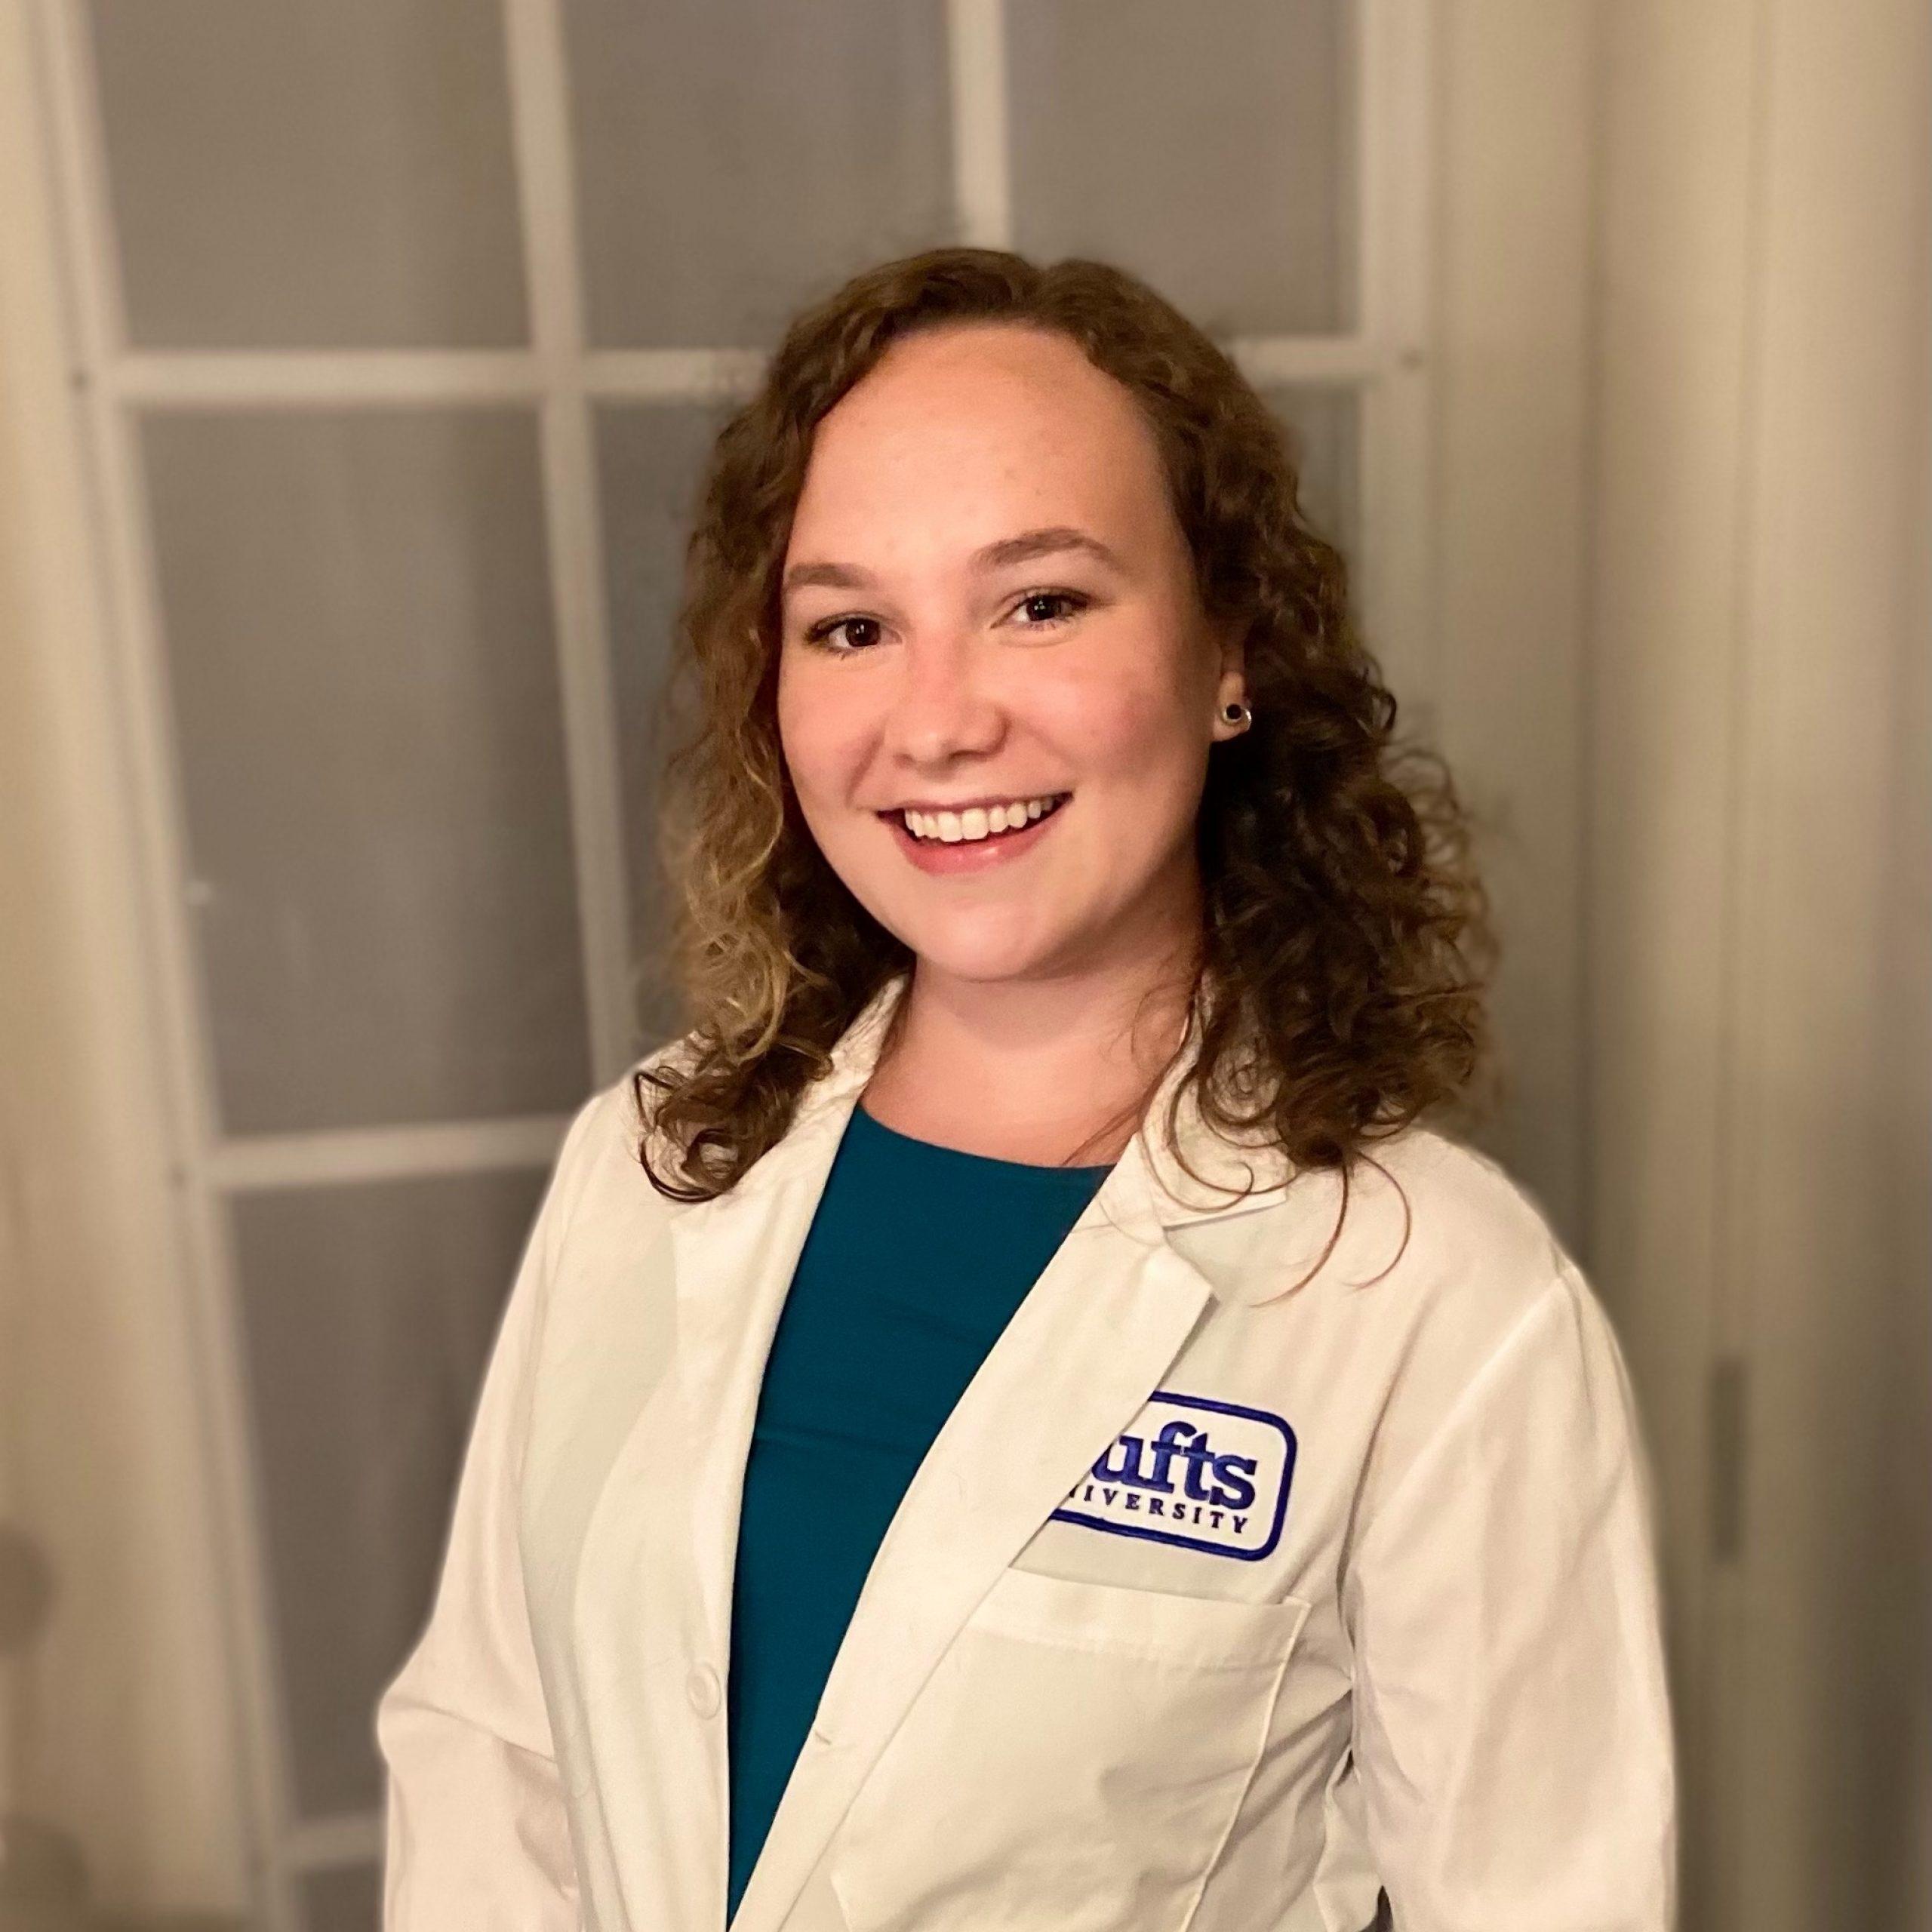 Leah Detolla, Veterinarian